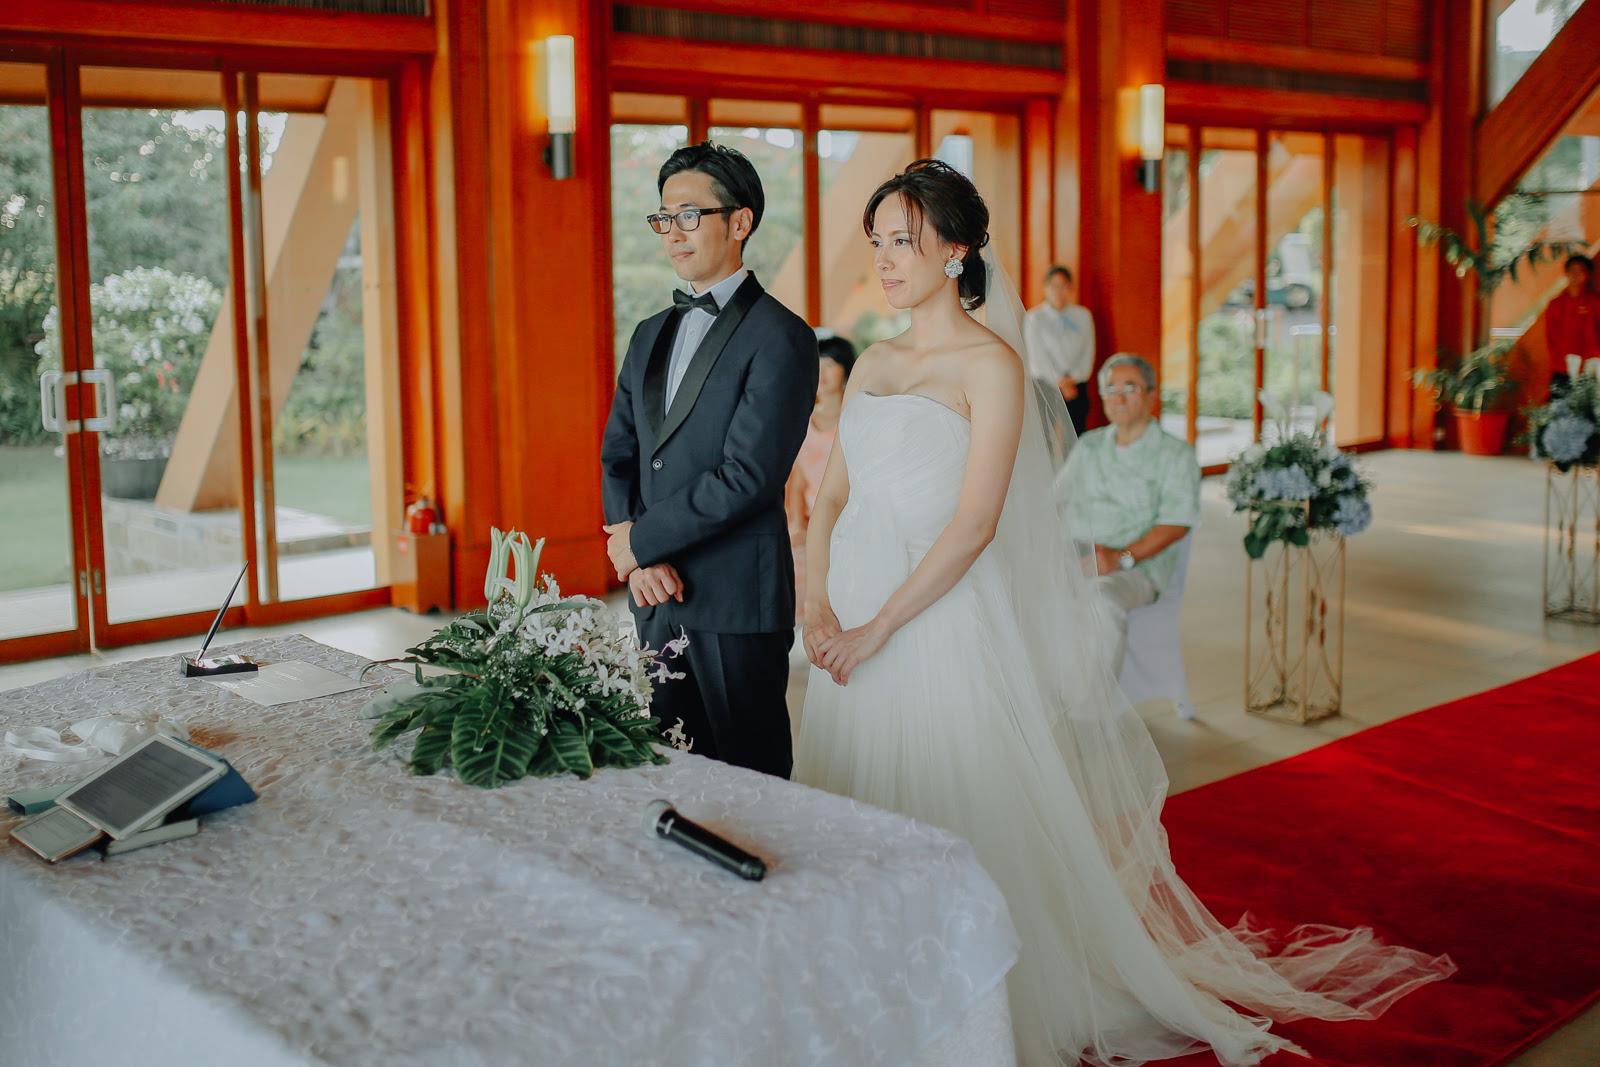 Mactan Cebu Destination Wedding